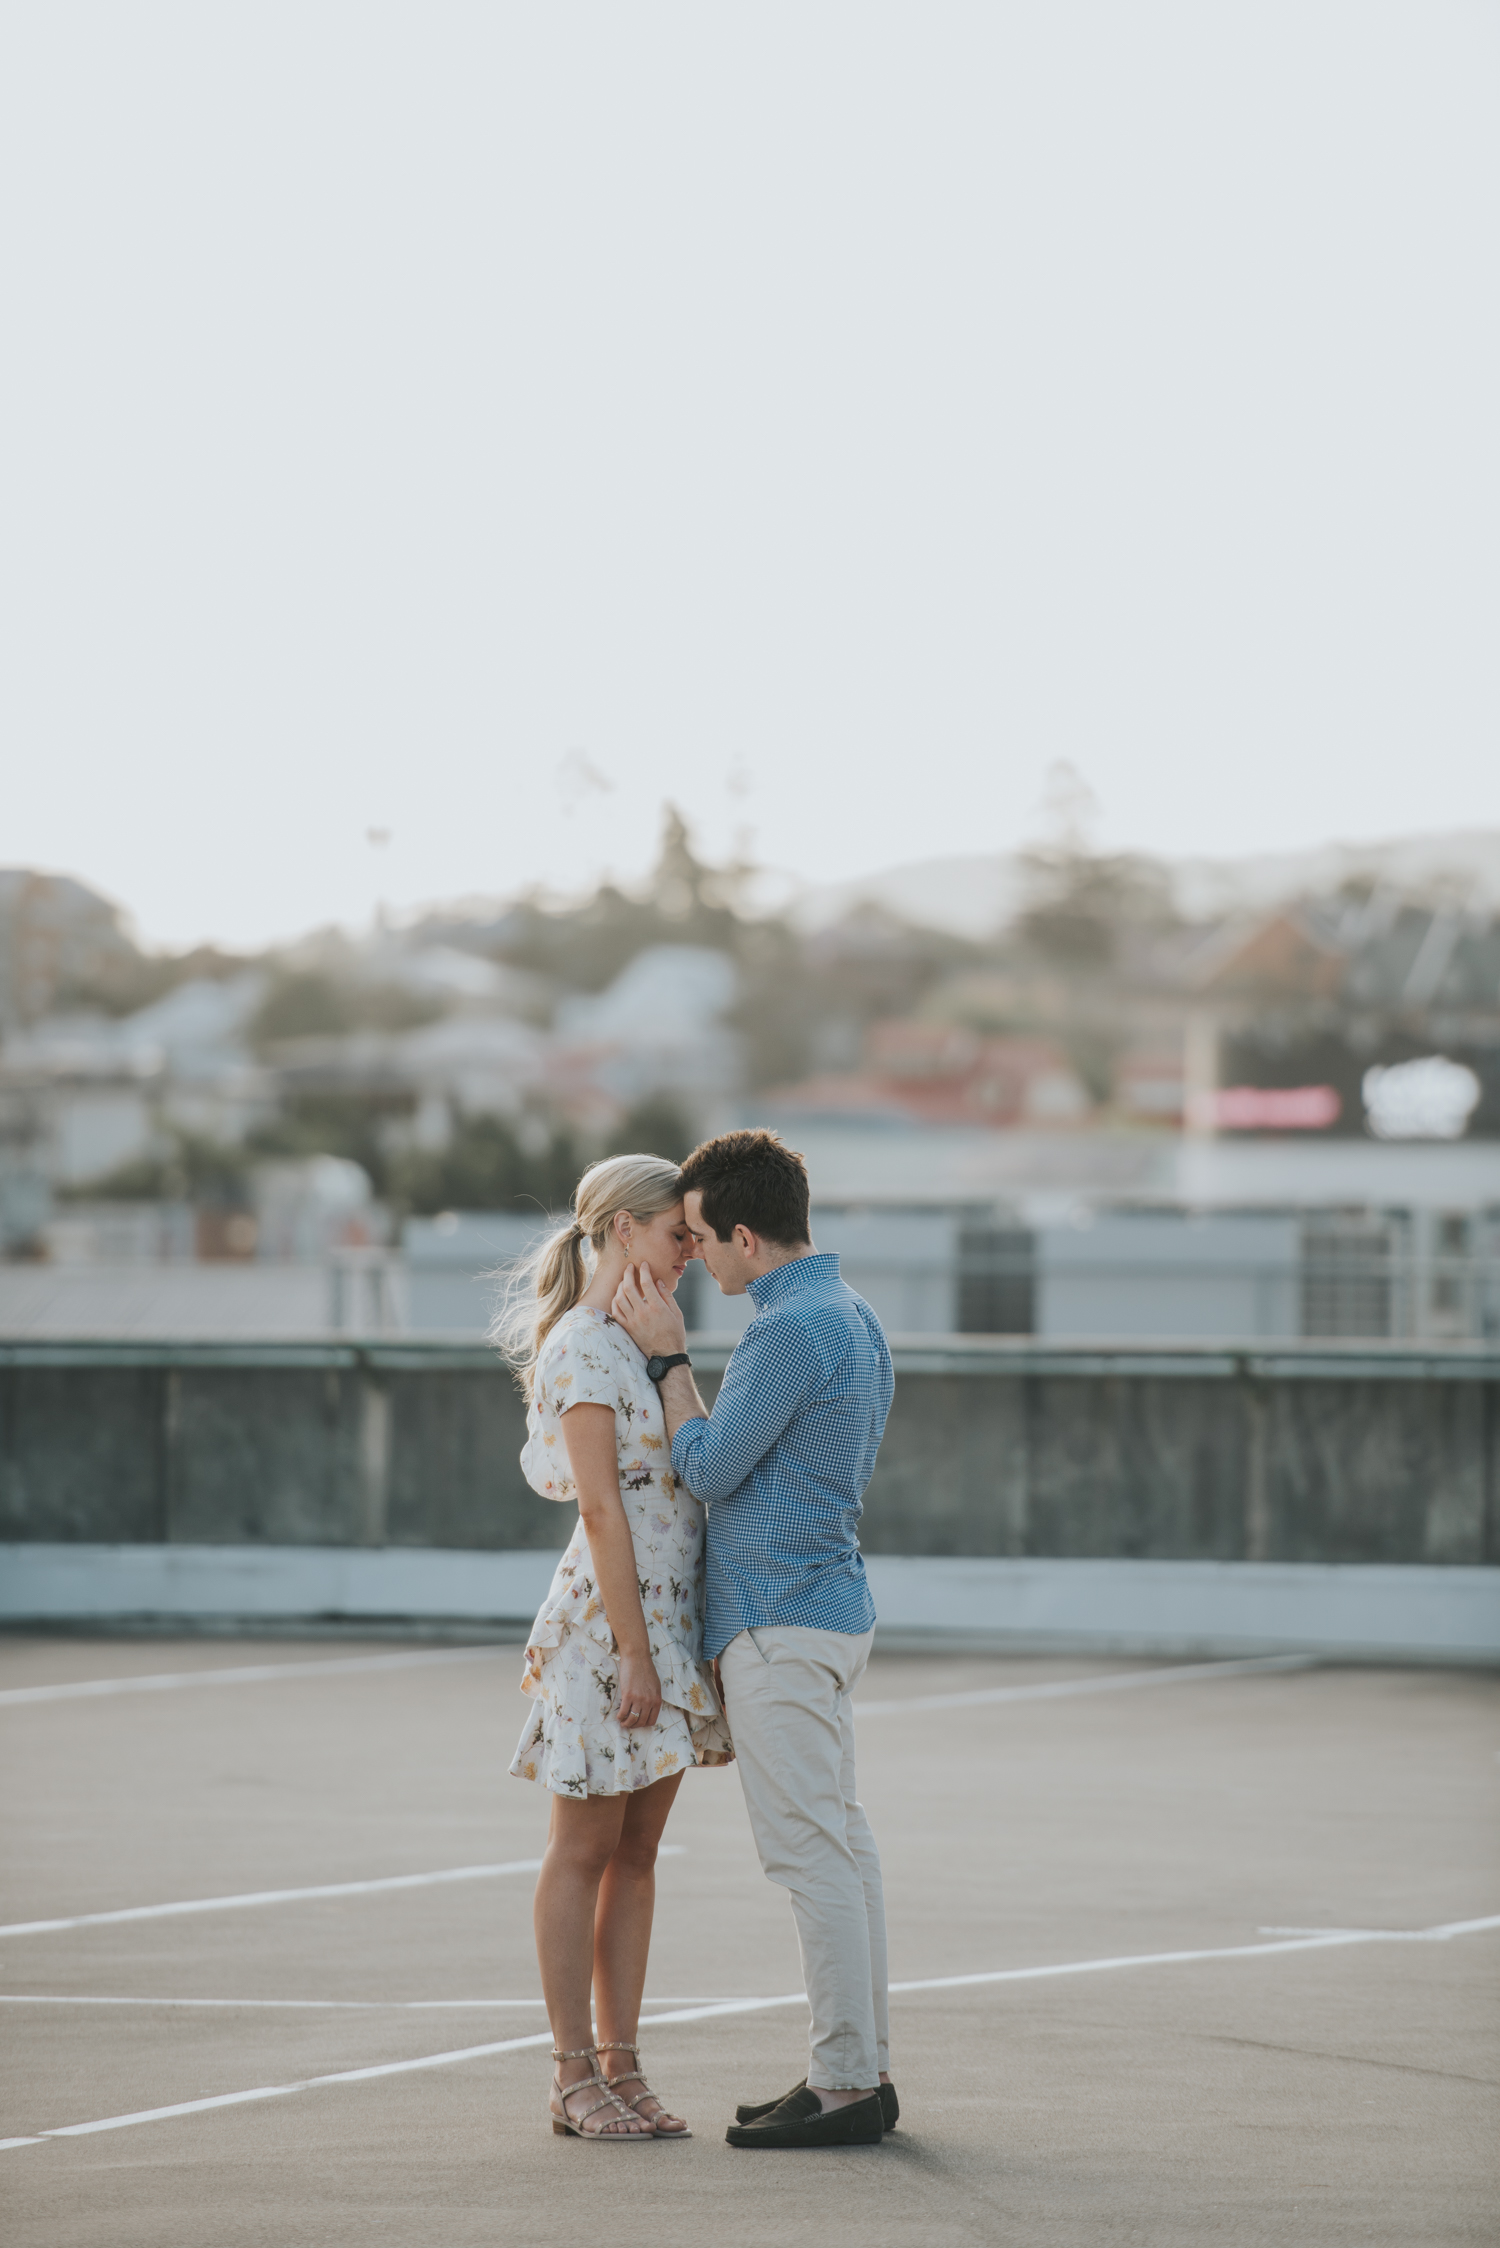 Brisbane Engagement | Wedding Photography-5.jpg